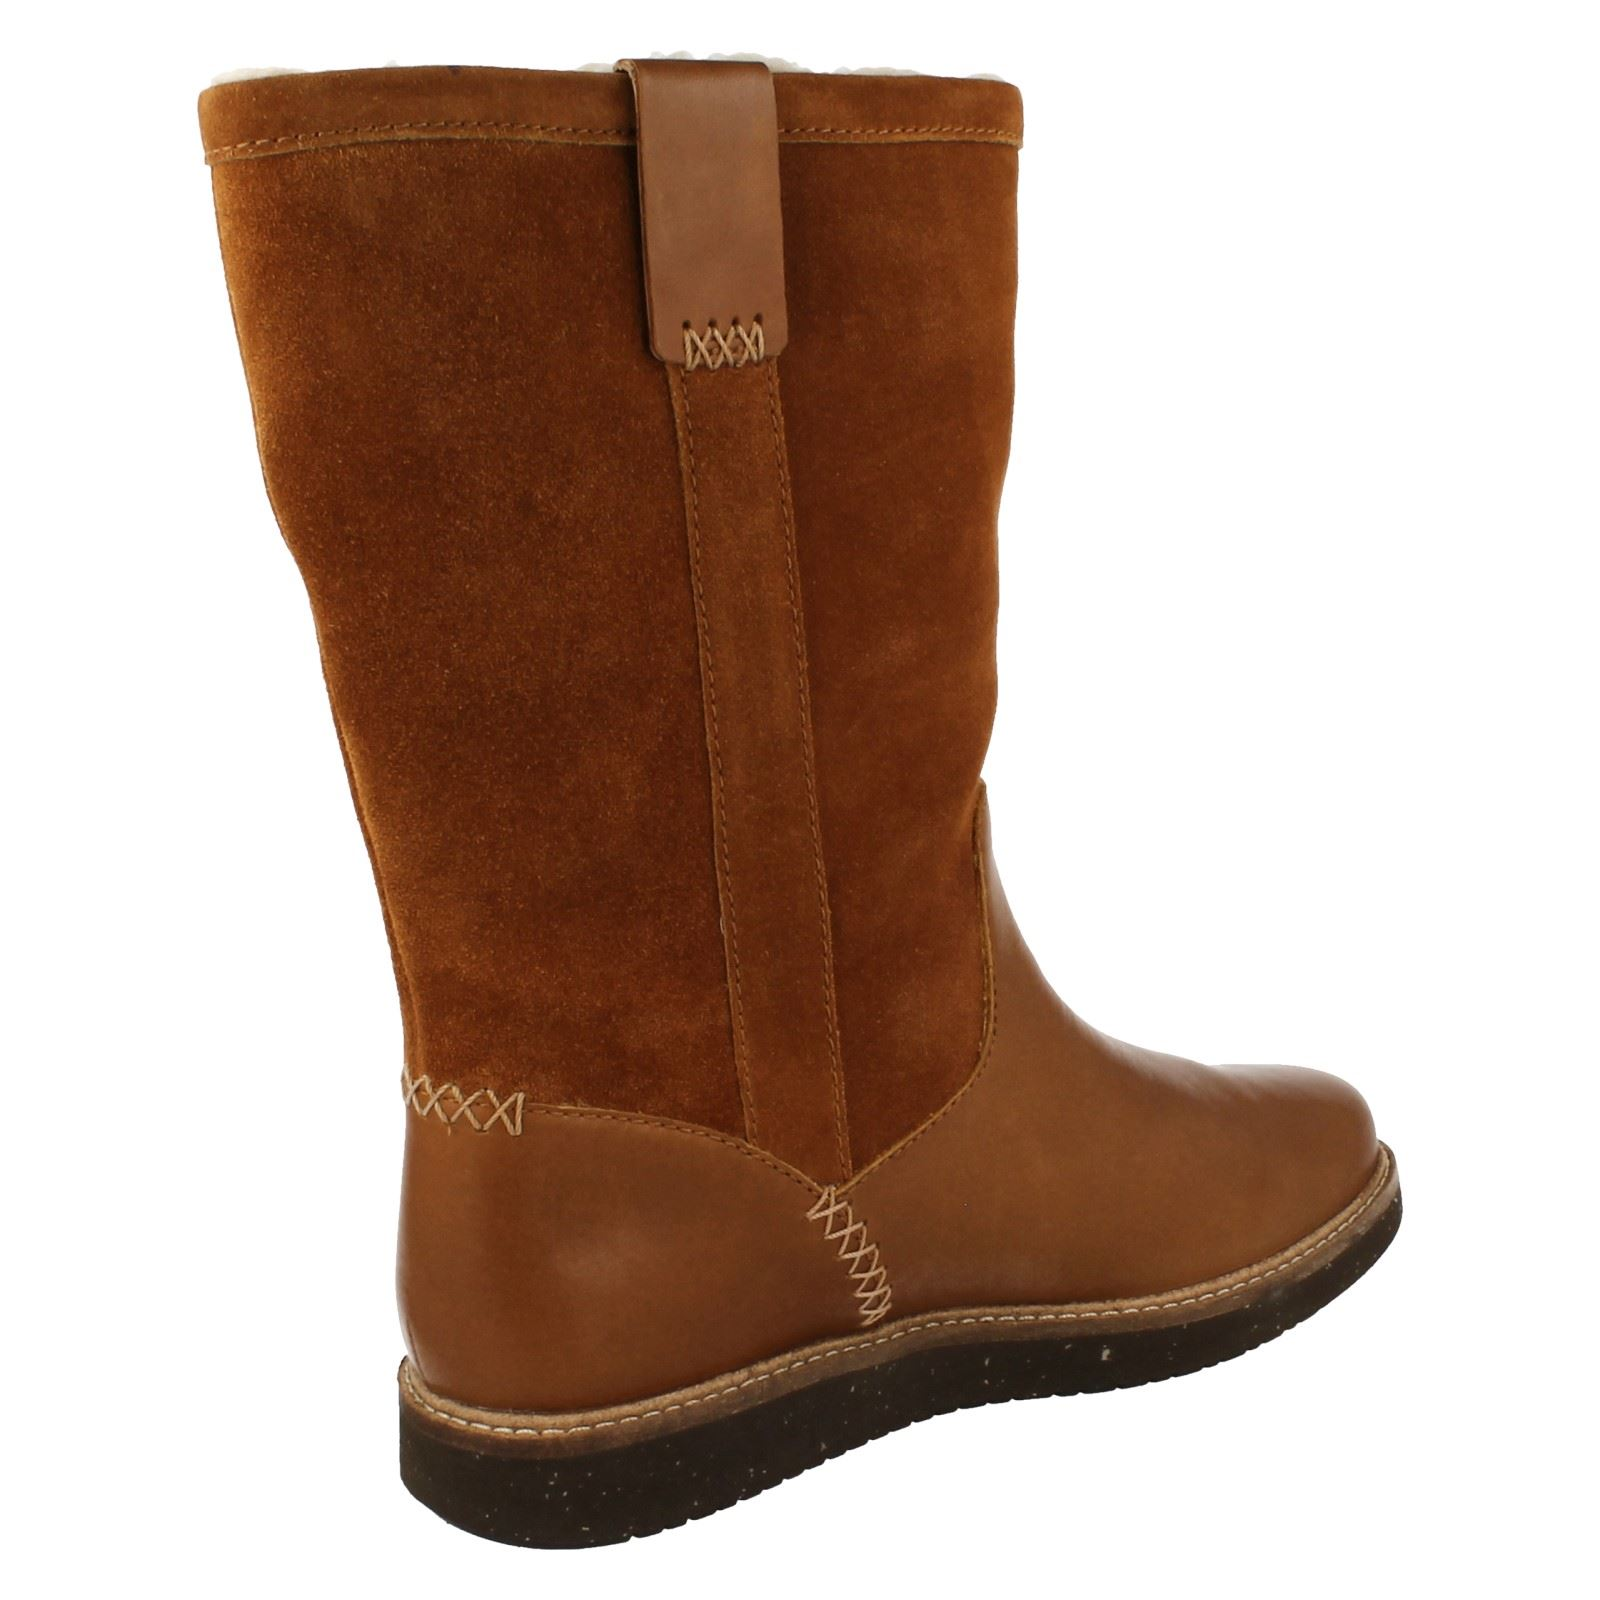 ed34c2a802 Ladies-Clarks-Glick-Elmfield-Mid-Calf-Boots thumbnail 16